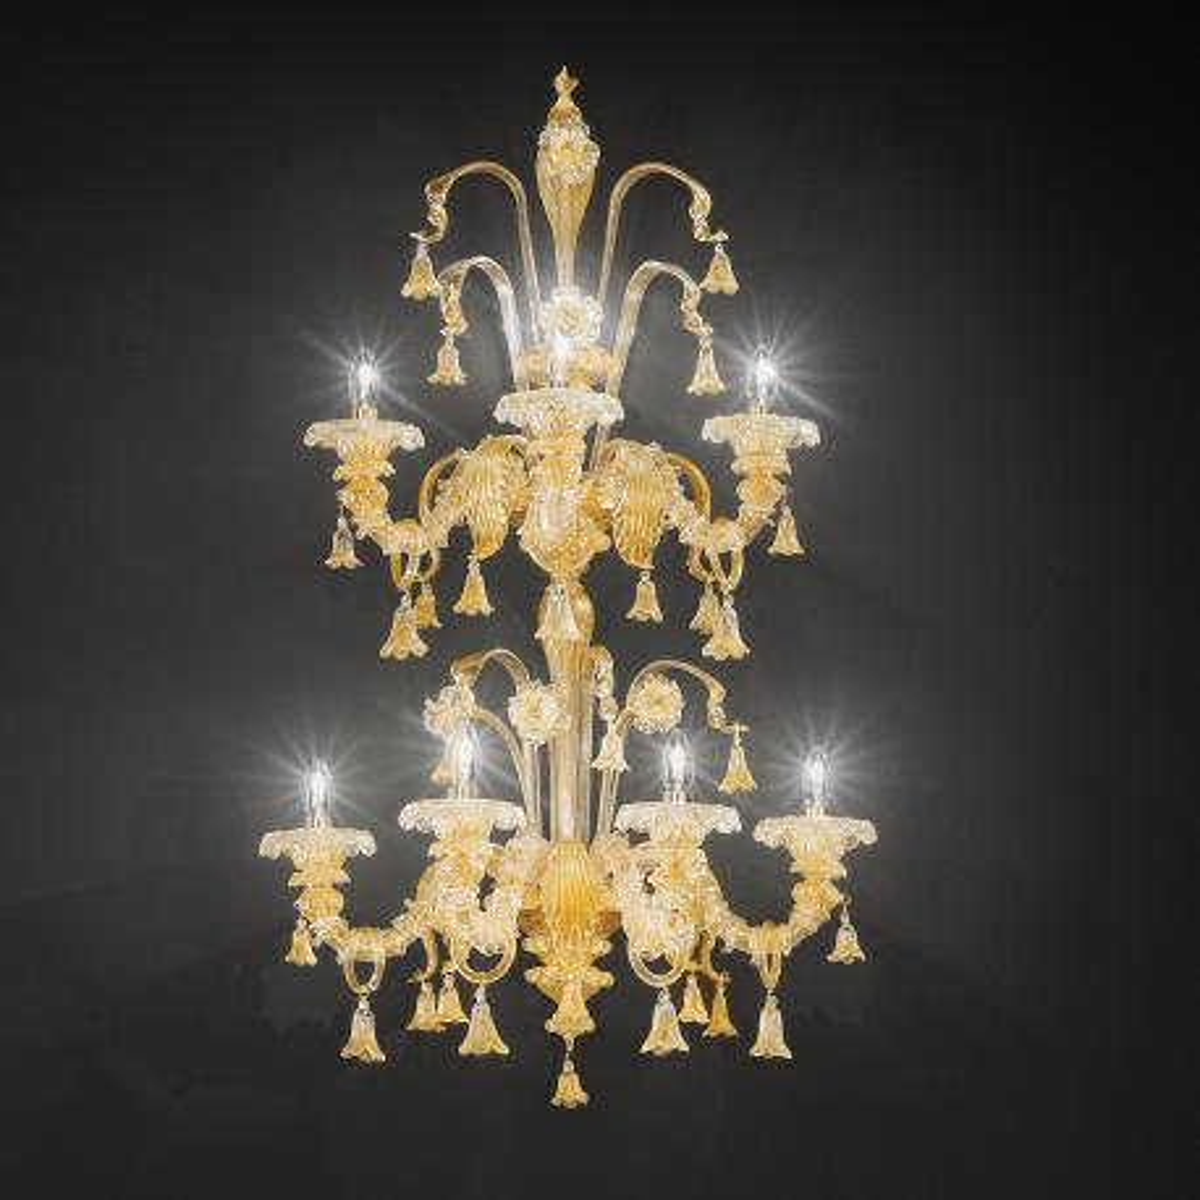 """Patrizia"" Murano glass sconce - 7+4 lights - gold"